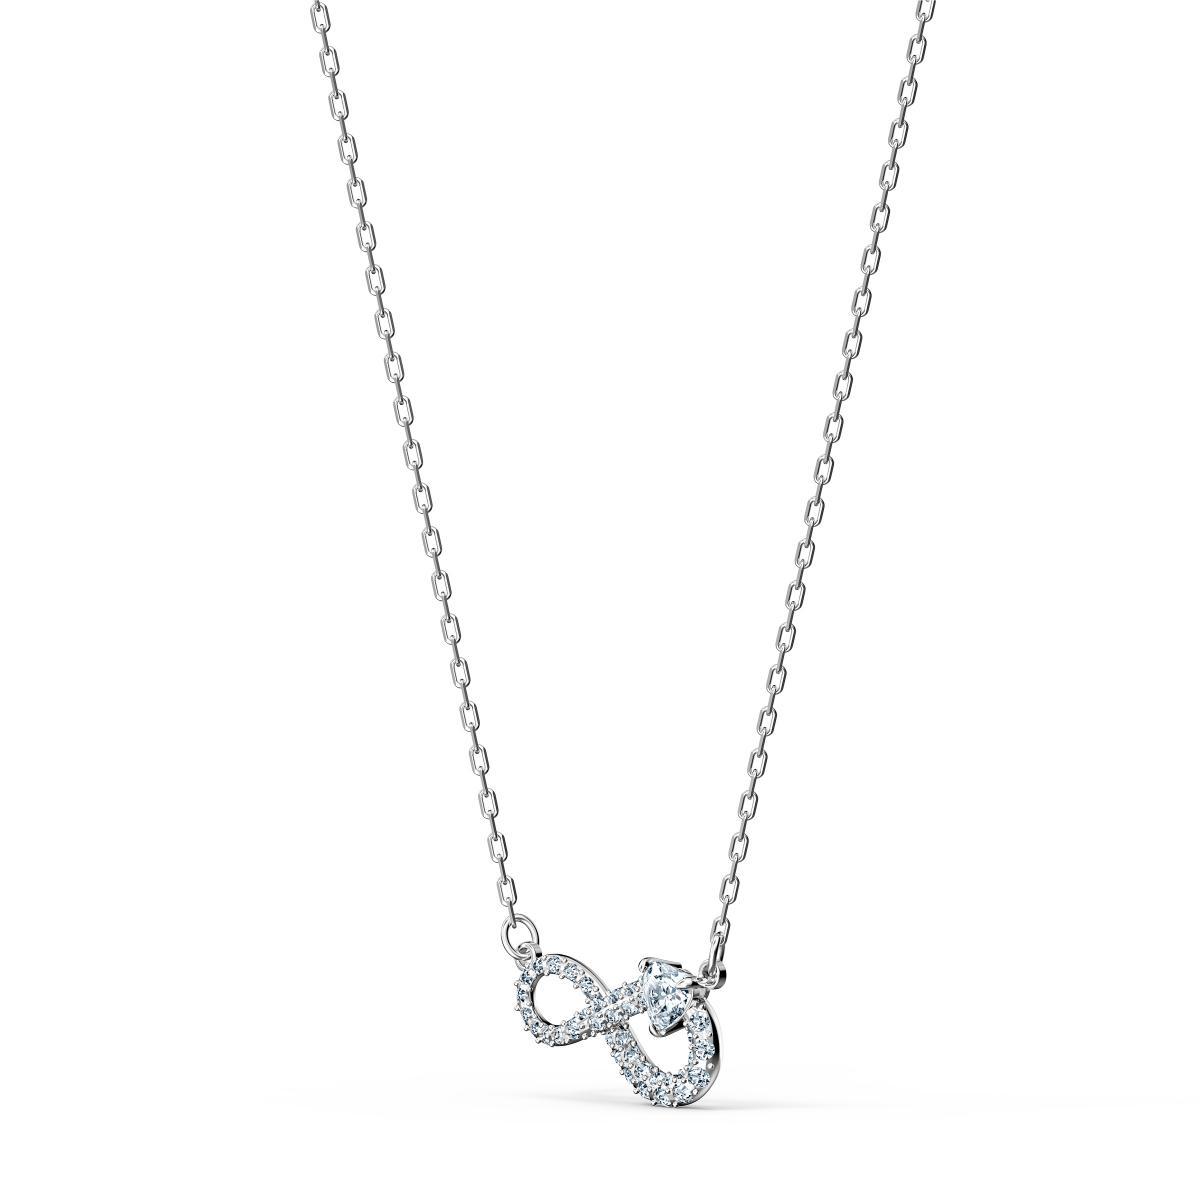 Collier Swarovski 5520576 - Collier étincelante pendentif Infini Femme